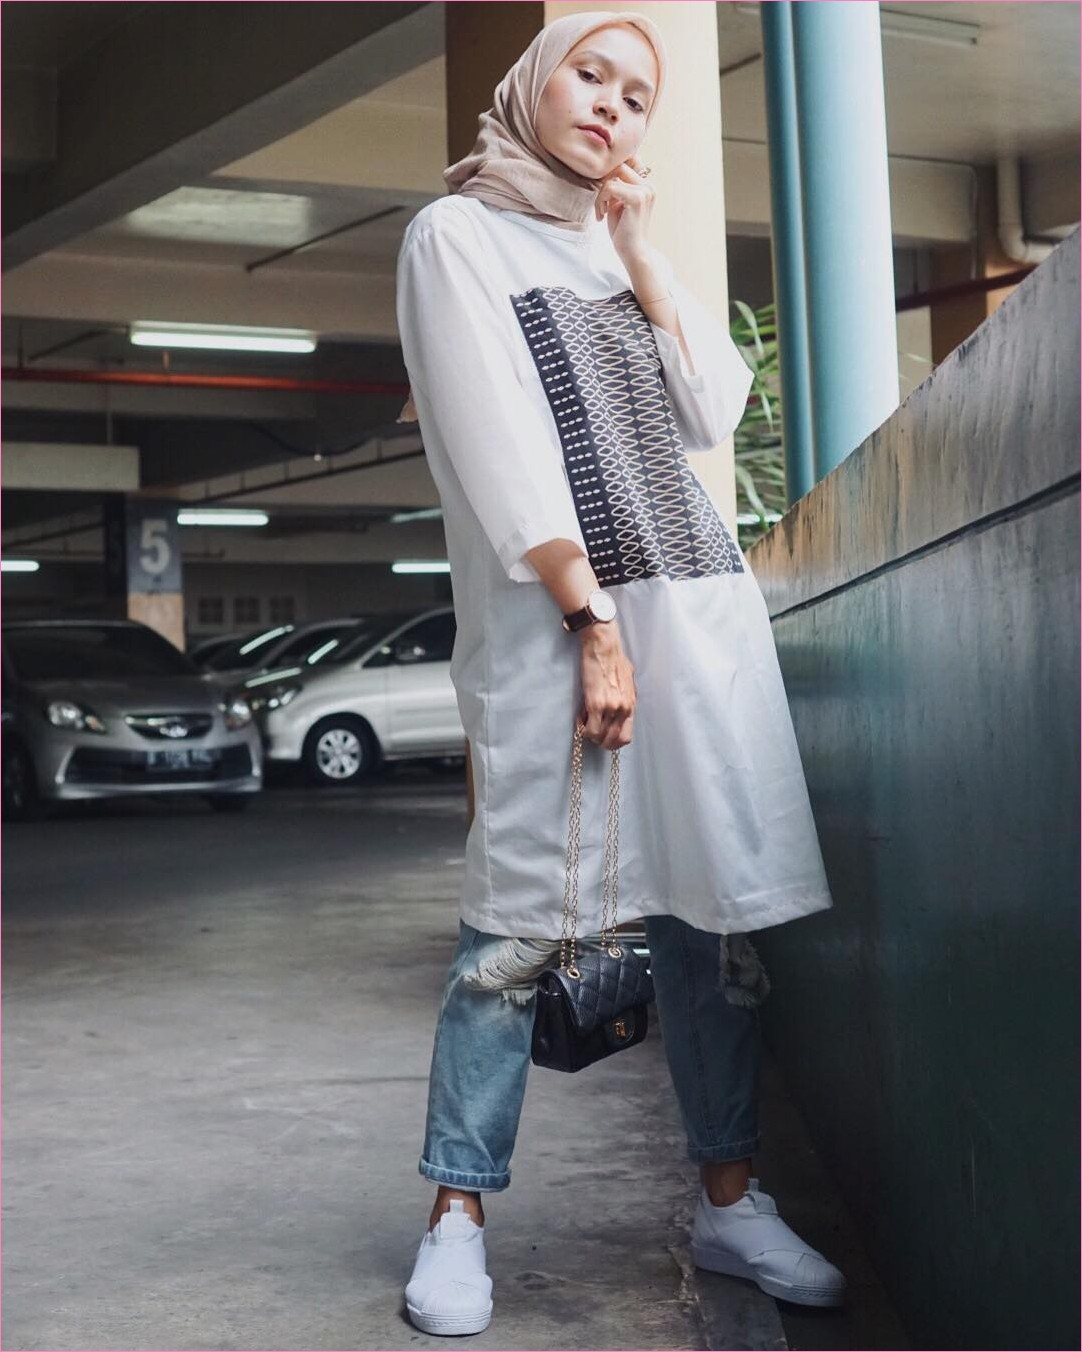 Outfit Baju Tunic Untuk Hijabers Ala Selebgram 2018 baju tunic putih slingbag channel celana jeans denim ciput rajut sepatu kets sneakers kerudung segiempat hijab square krem jam tangan ootd trendy kekinian basement mall mobil